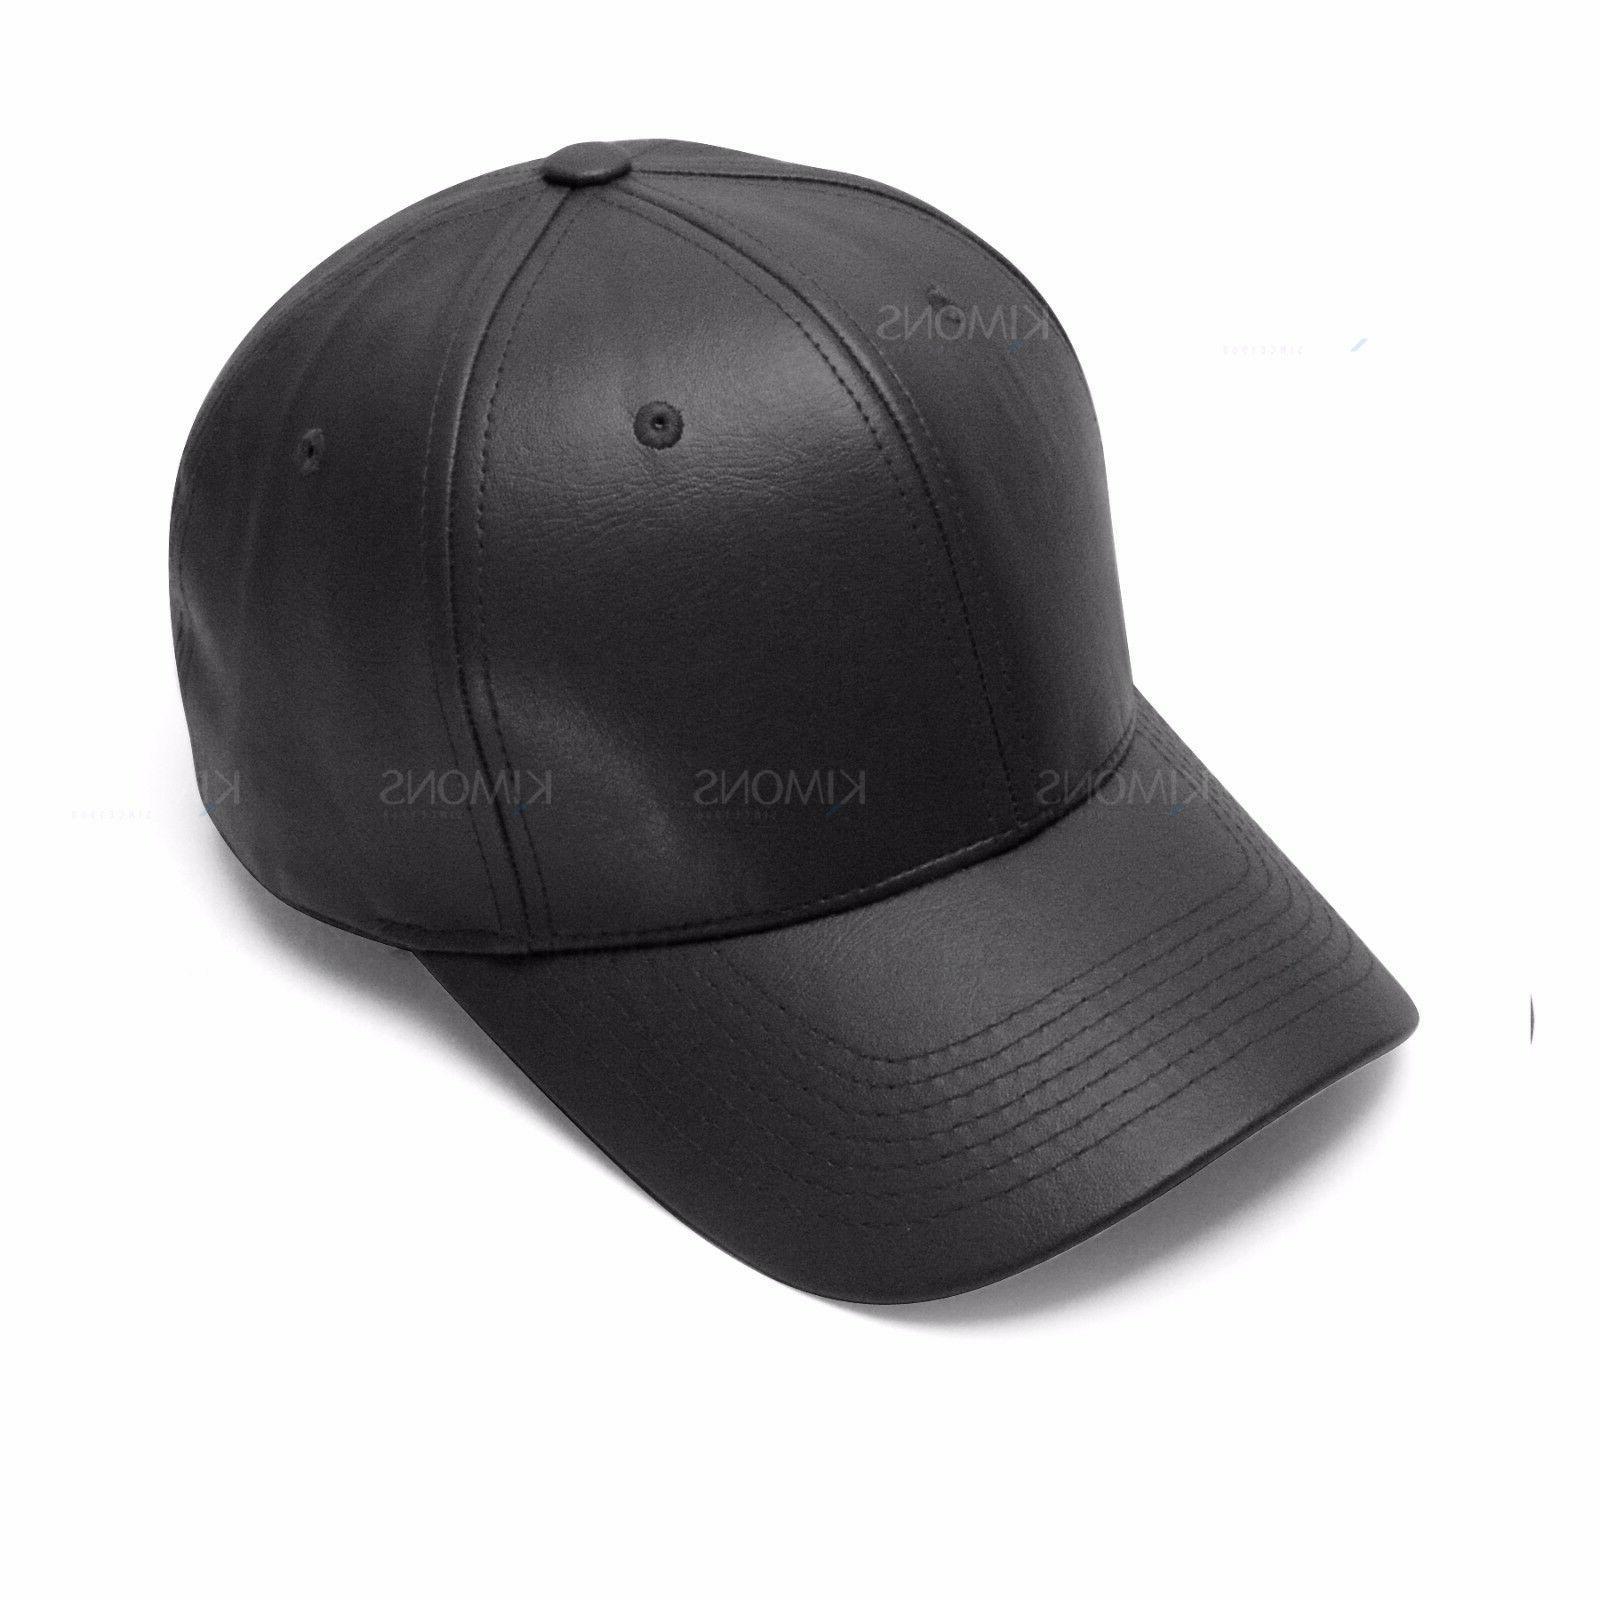 V-Adjustable Solid Leather Classic Unisex Baseball Plain Blank Hat